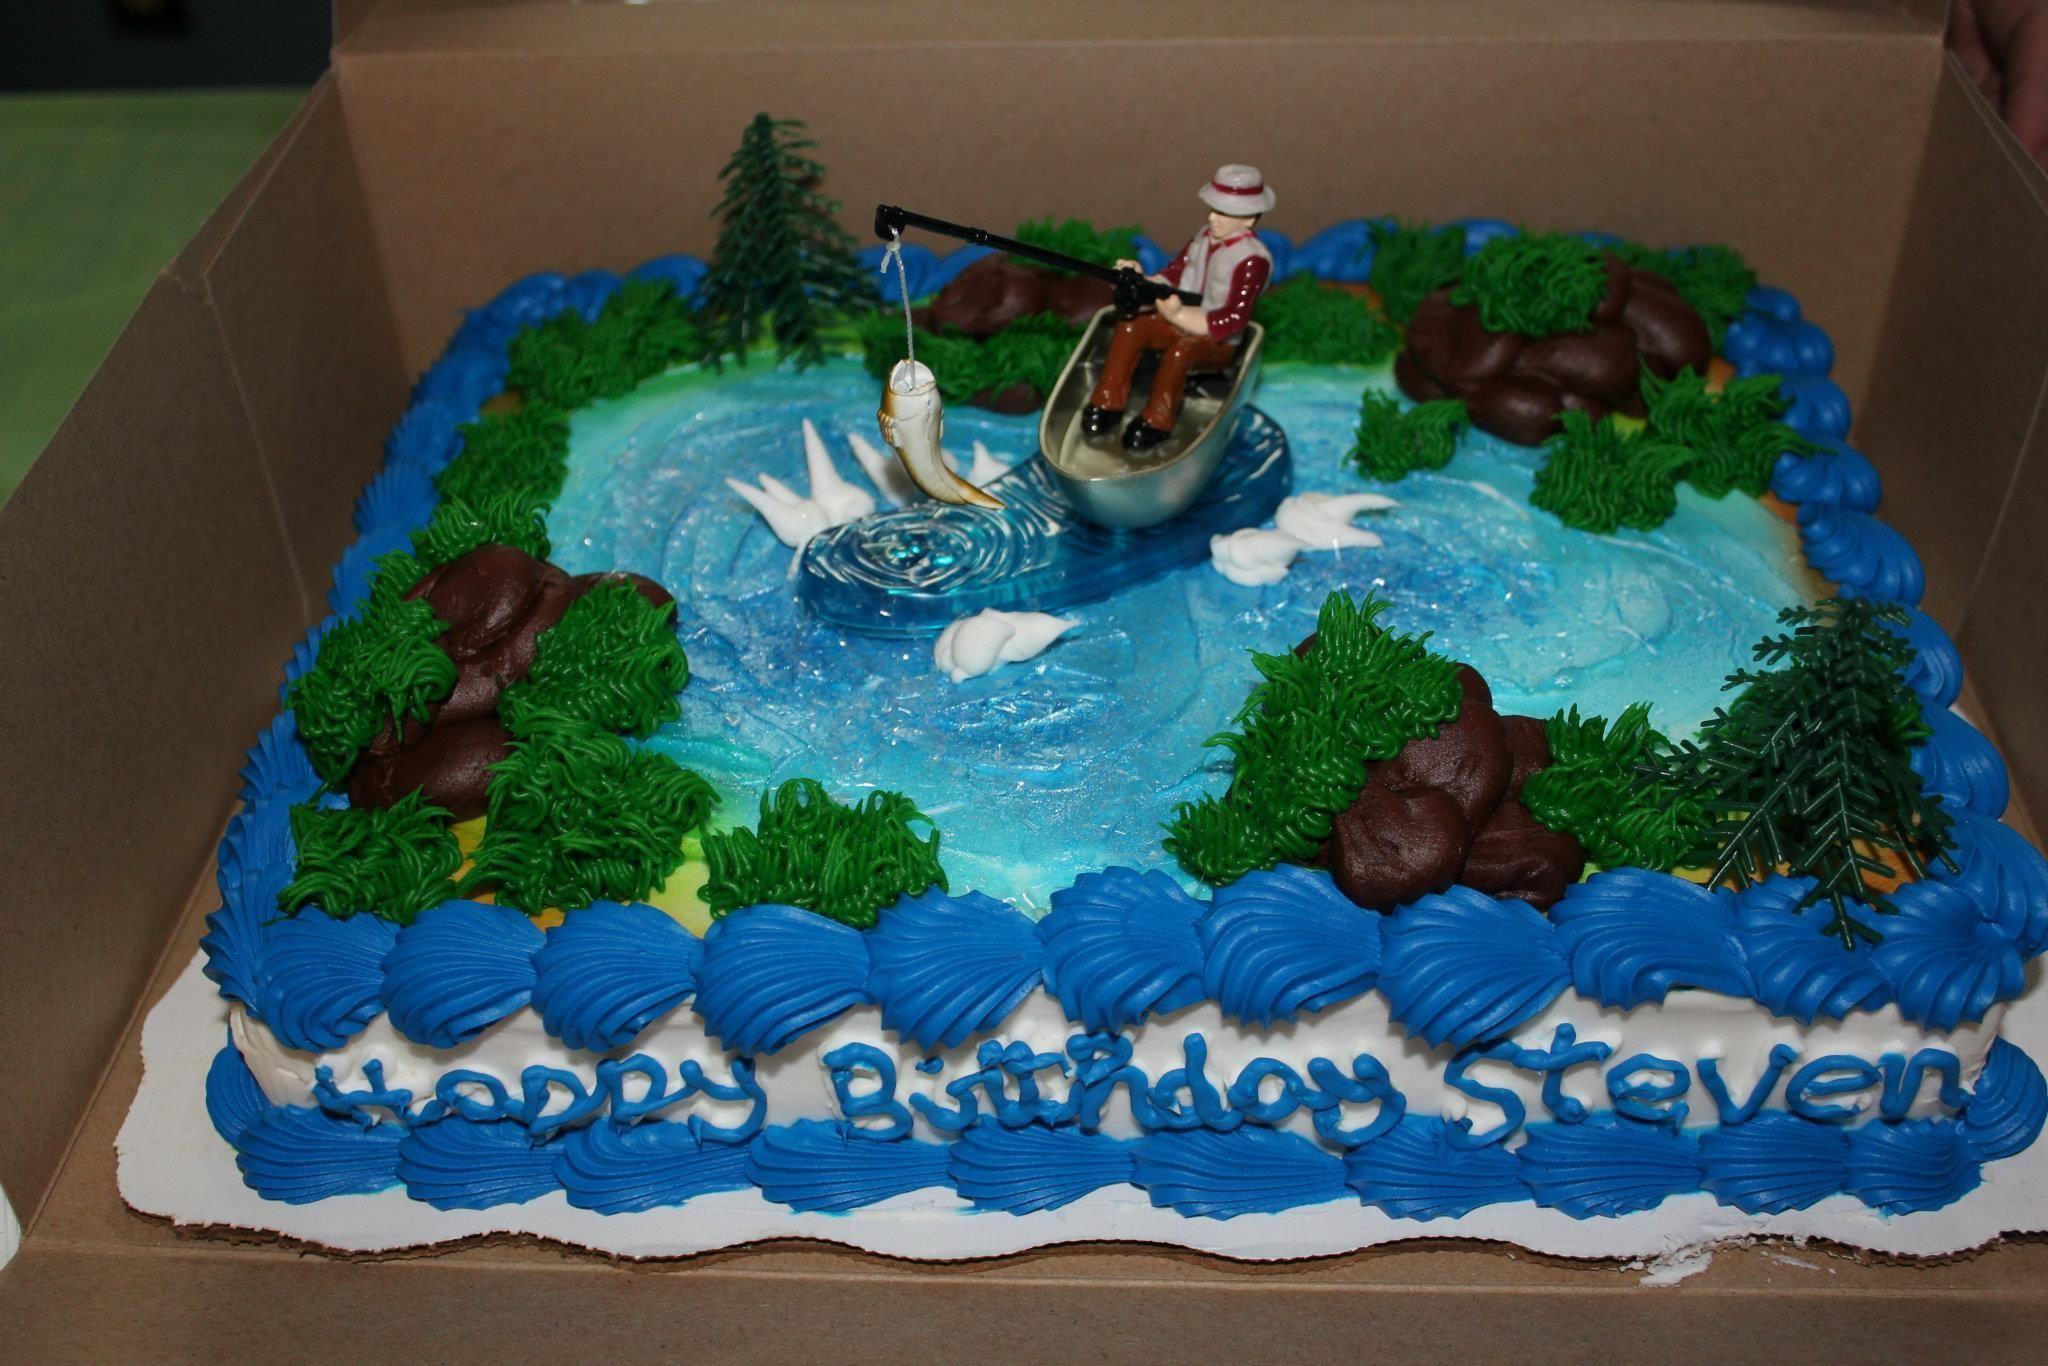 Pleasing Craftylillybargainbin Blogspot Com Walmart Bakery Birthday Funny Birthday Cards Online Unhofree Goldxyz